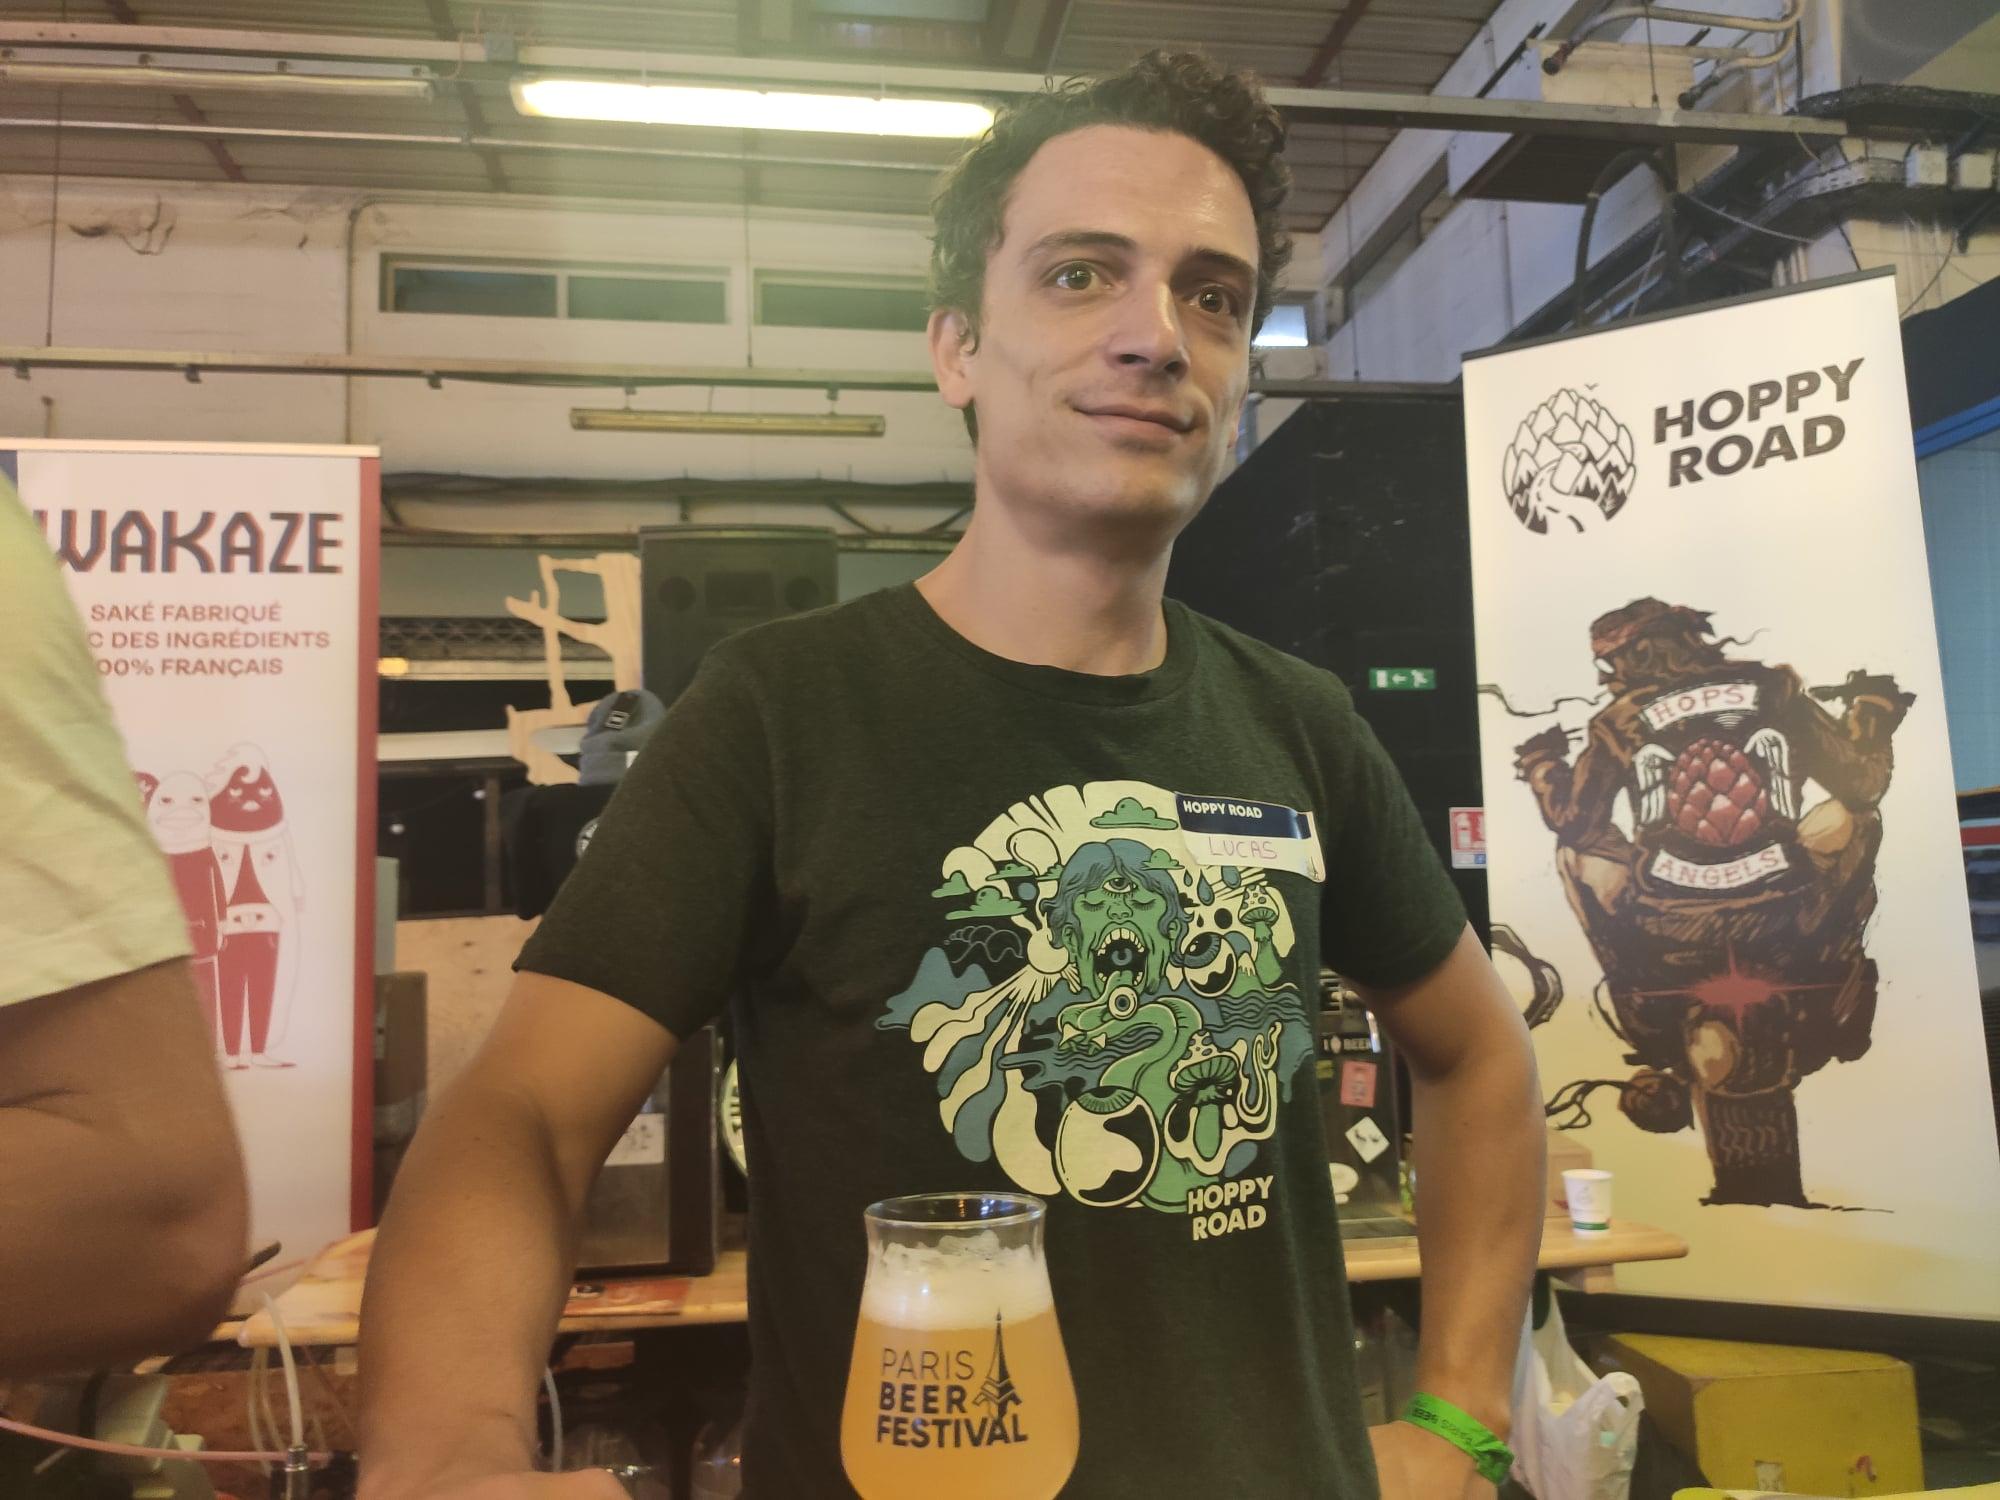 Paris Beer Festival - Lucas del Biondo - Hoppy Road